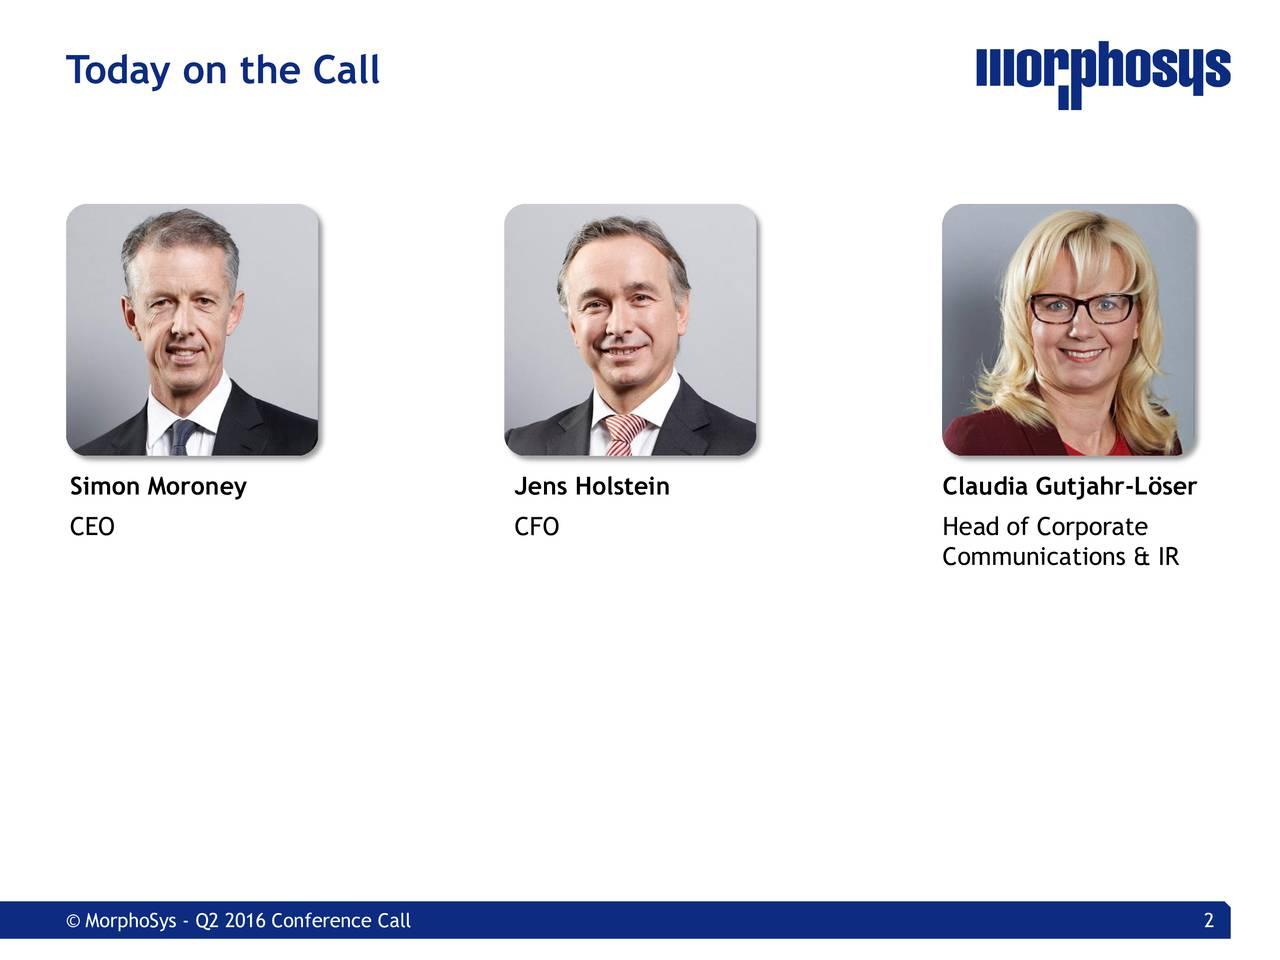 Simon Moroney Jens Holstein Claudia Gutjahr-Lser CEO CFO Head of Corporate Communications & IR MorphoSys - Q2 2016 Conference Call 2